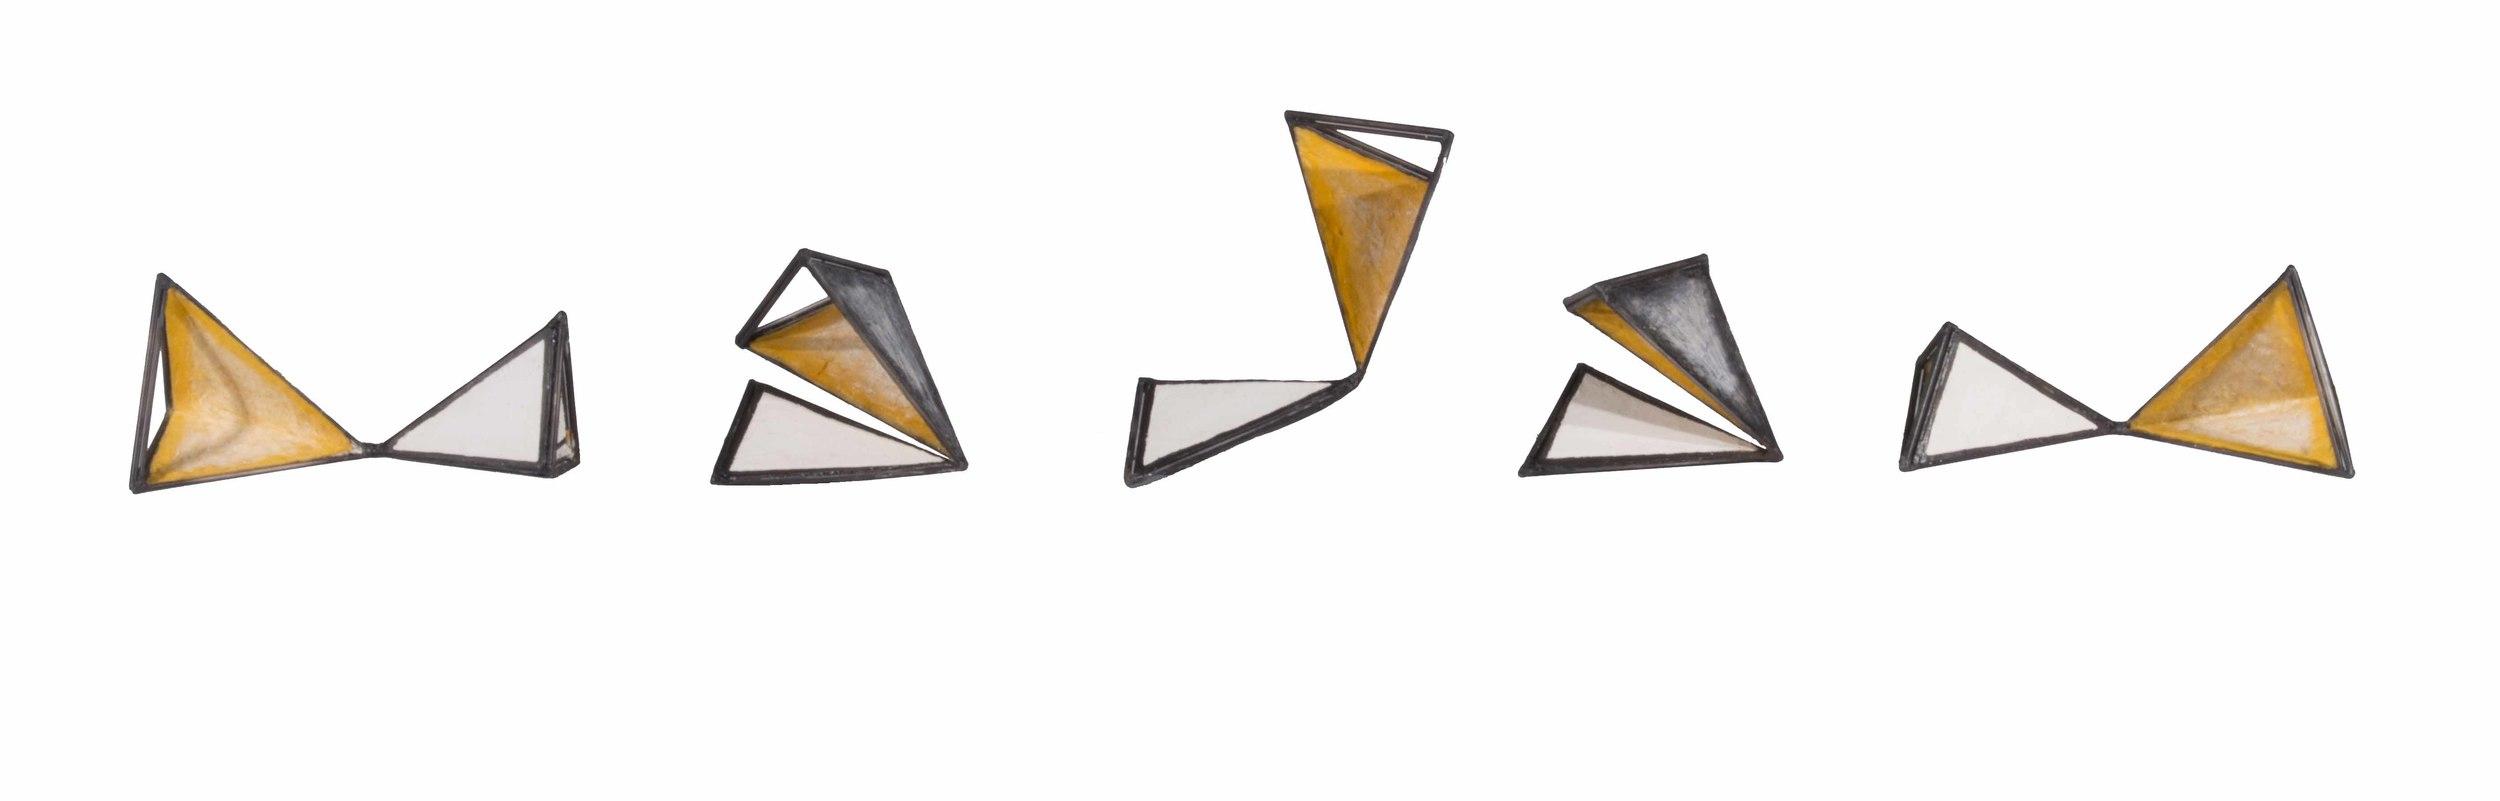 Triangular Foldings Large 1885